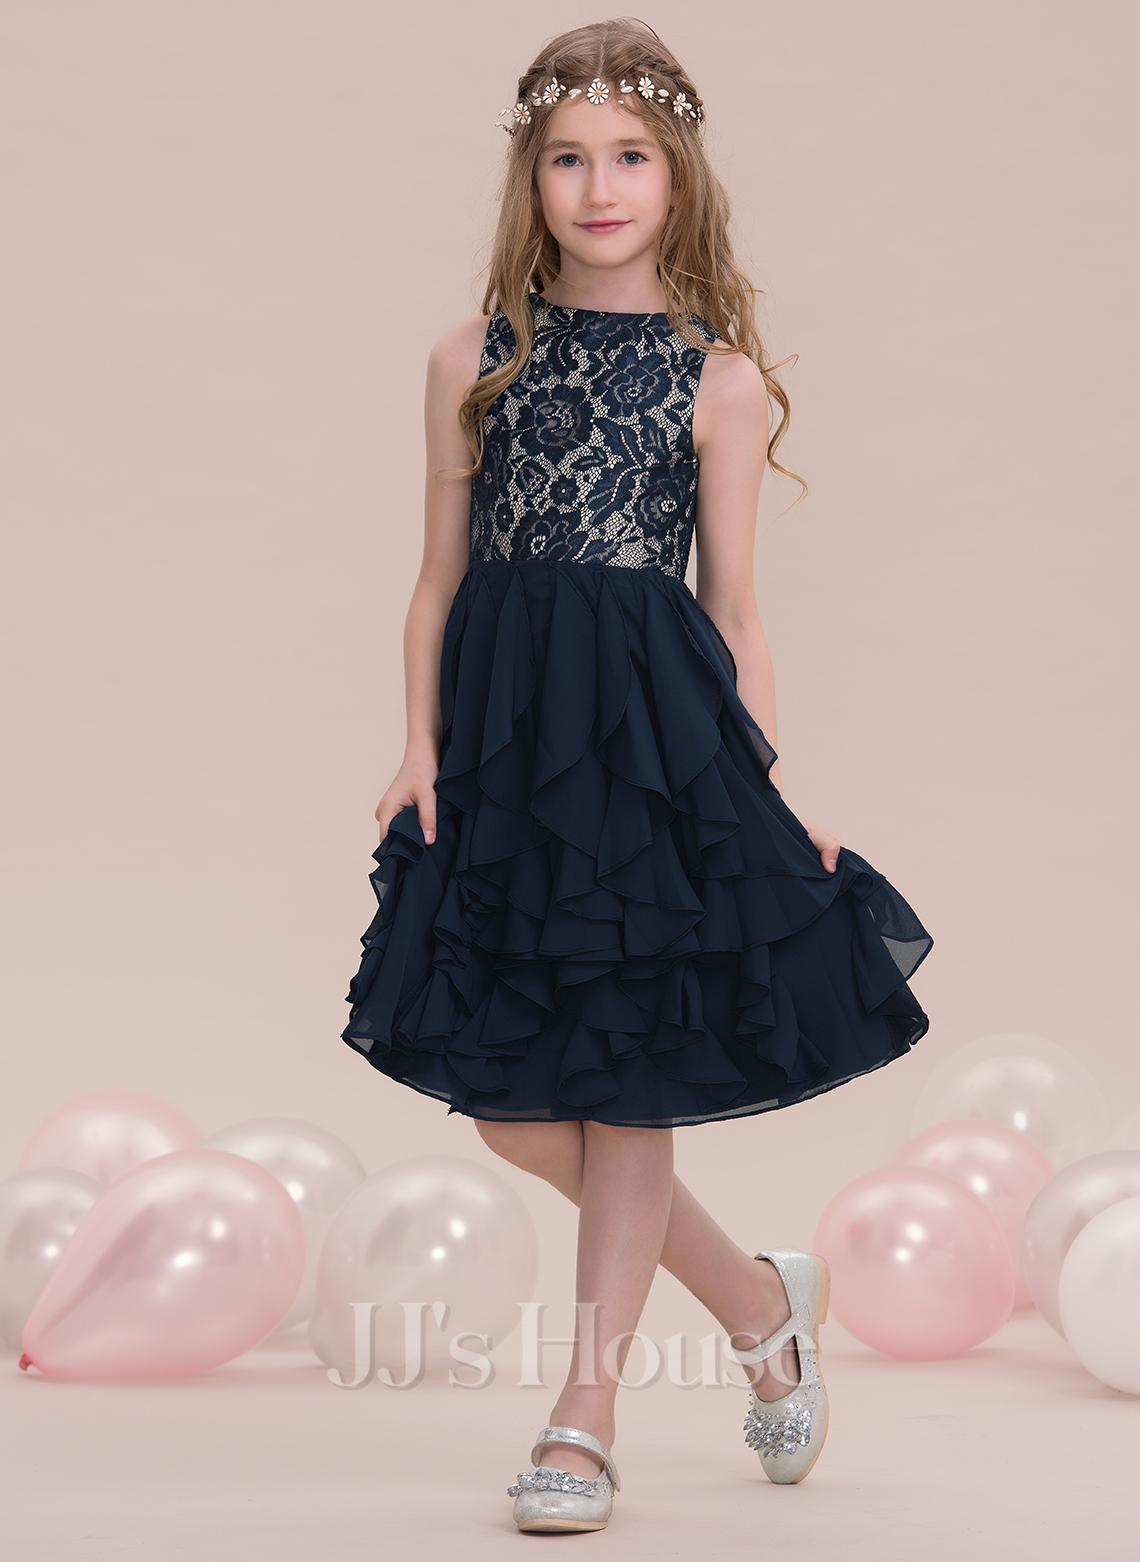 A-Line Scoop Neck Knee-Length Chiffon Junior Bridesmaid Dress With Cascading Ruffles